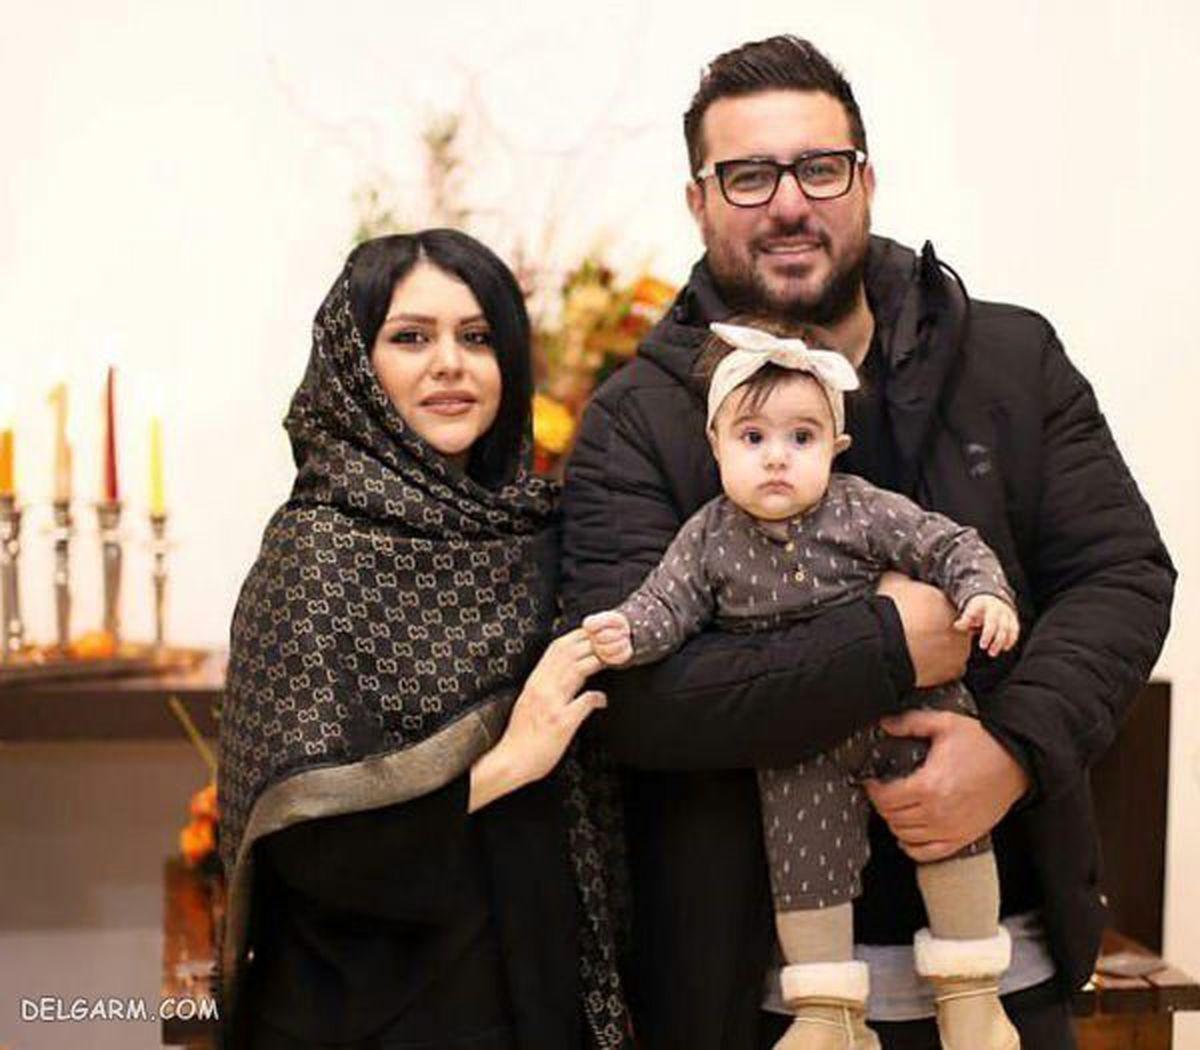 مراسم سالگرد ازدواج محسن کیایی و همسرش + عکس